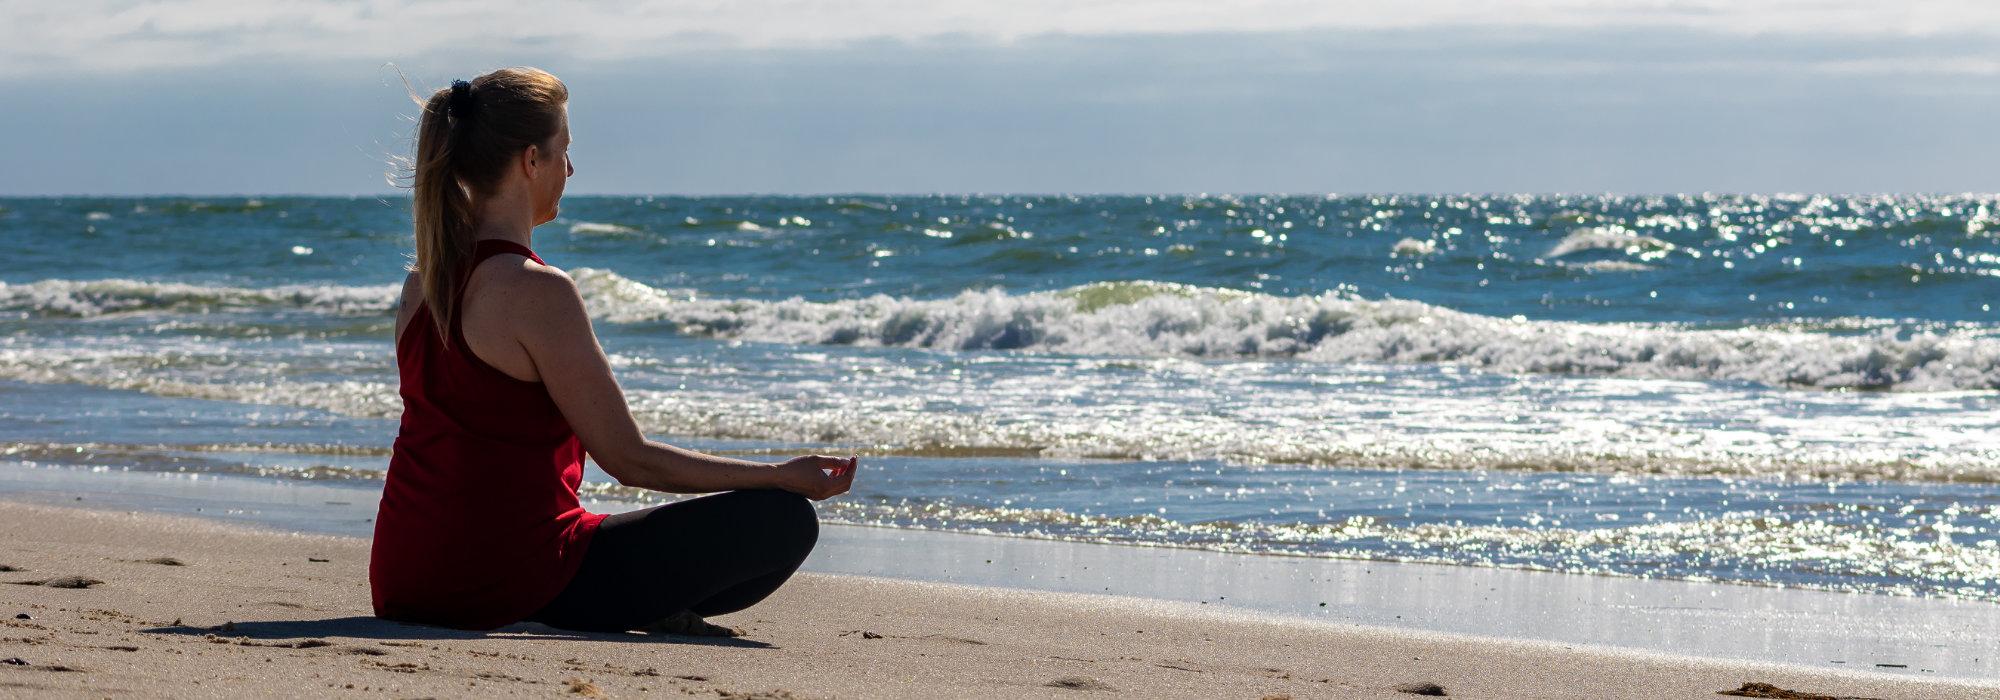 yoga-014.jpg